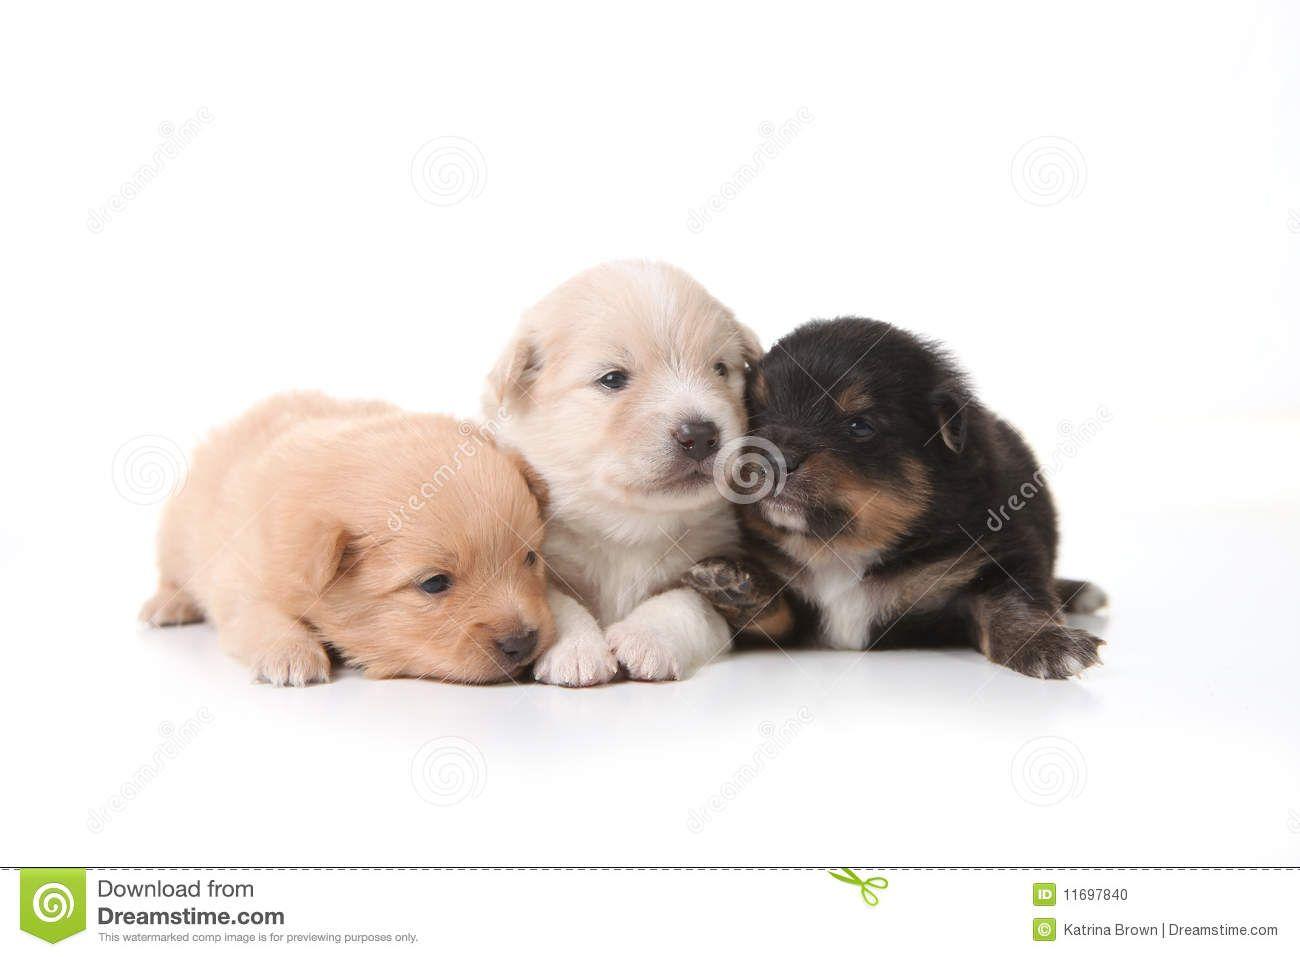 Three Pomeranian Newborn Puppies With Eyes Open Newborn Puppies Puppies Puppy Eyes